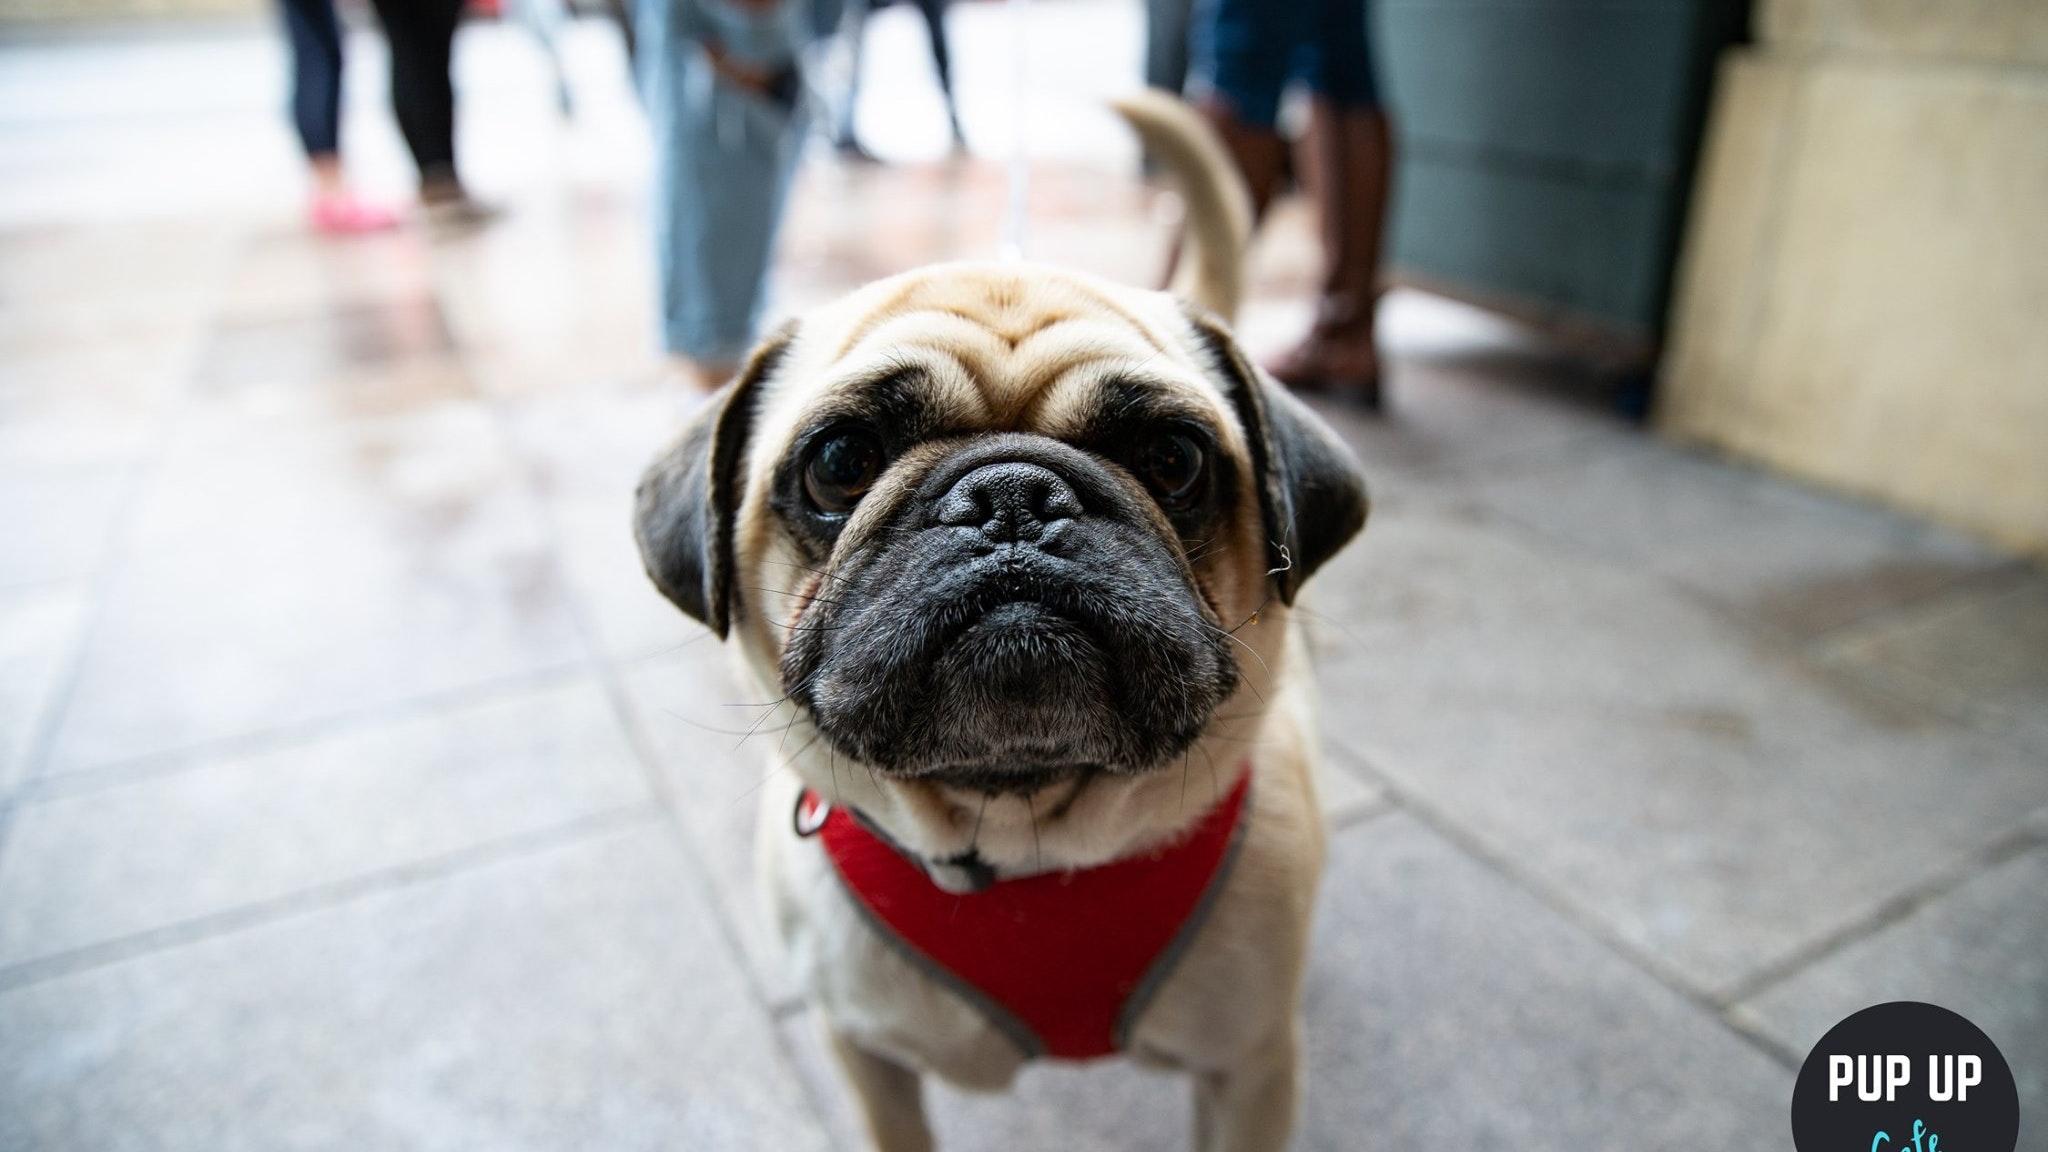 Pug Pop Up Cafe – Cardiff